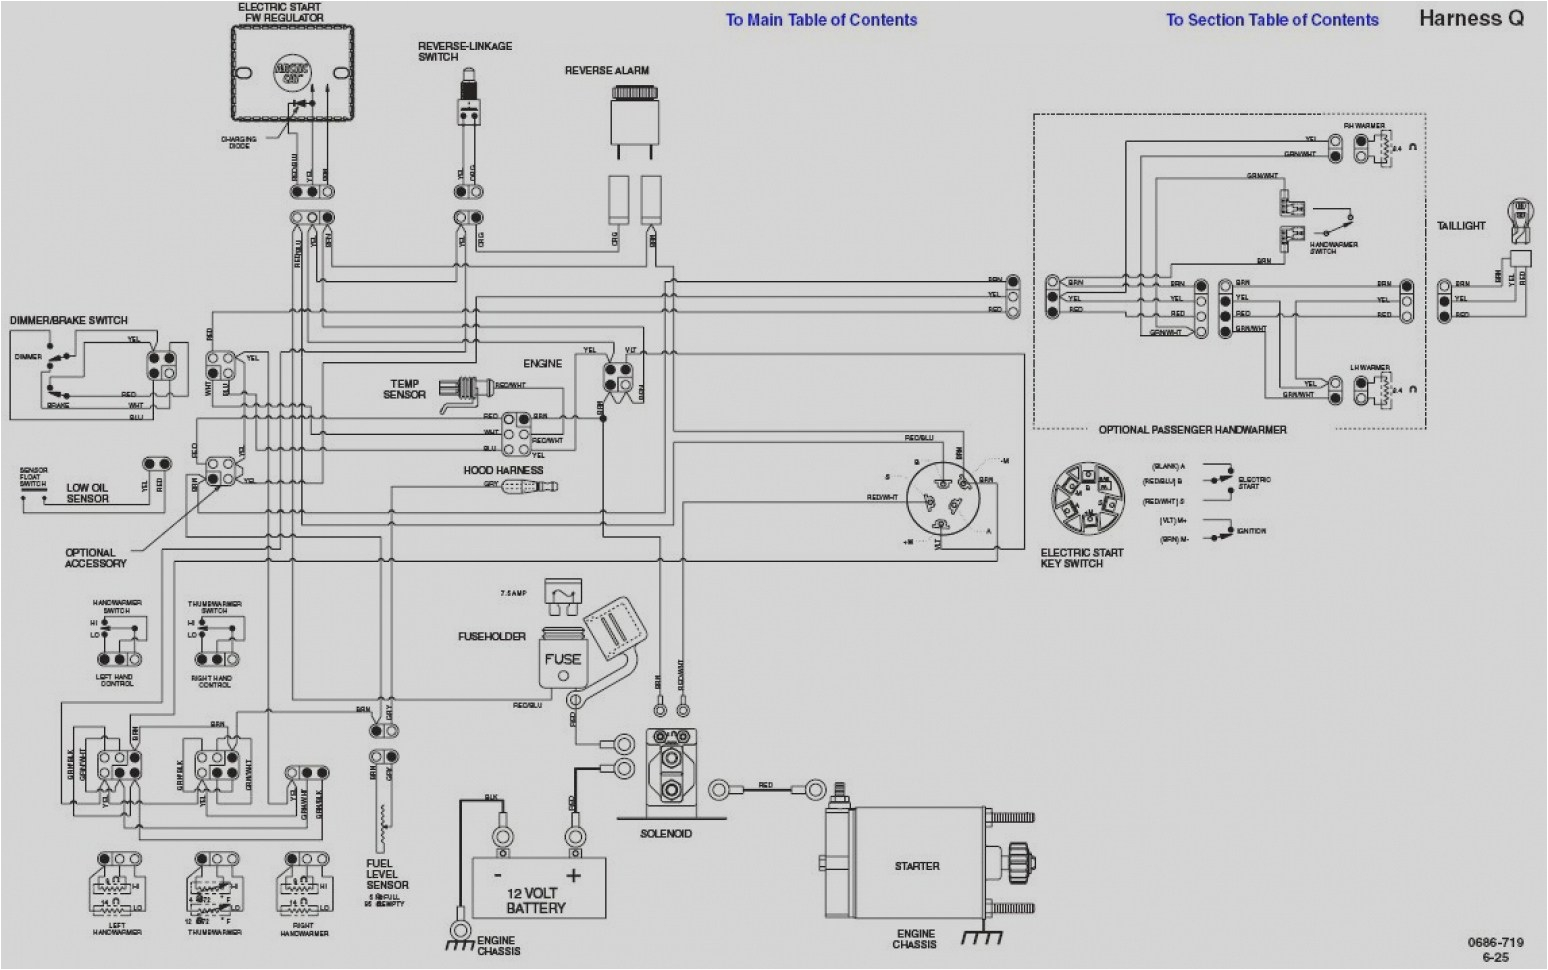 Polaris Ignition Switch Wiring Diagram Polaris Ignition Wiring Diagram Wiring Diagram Database